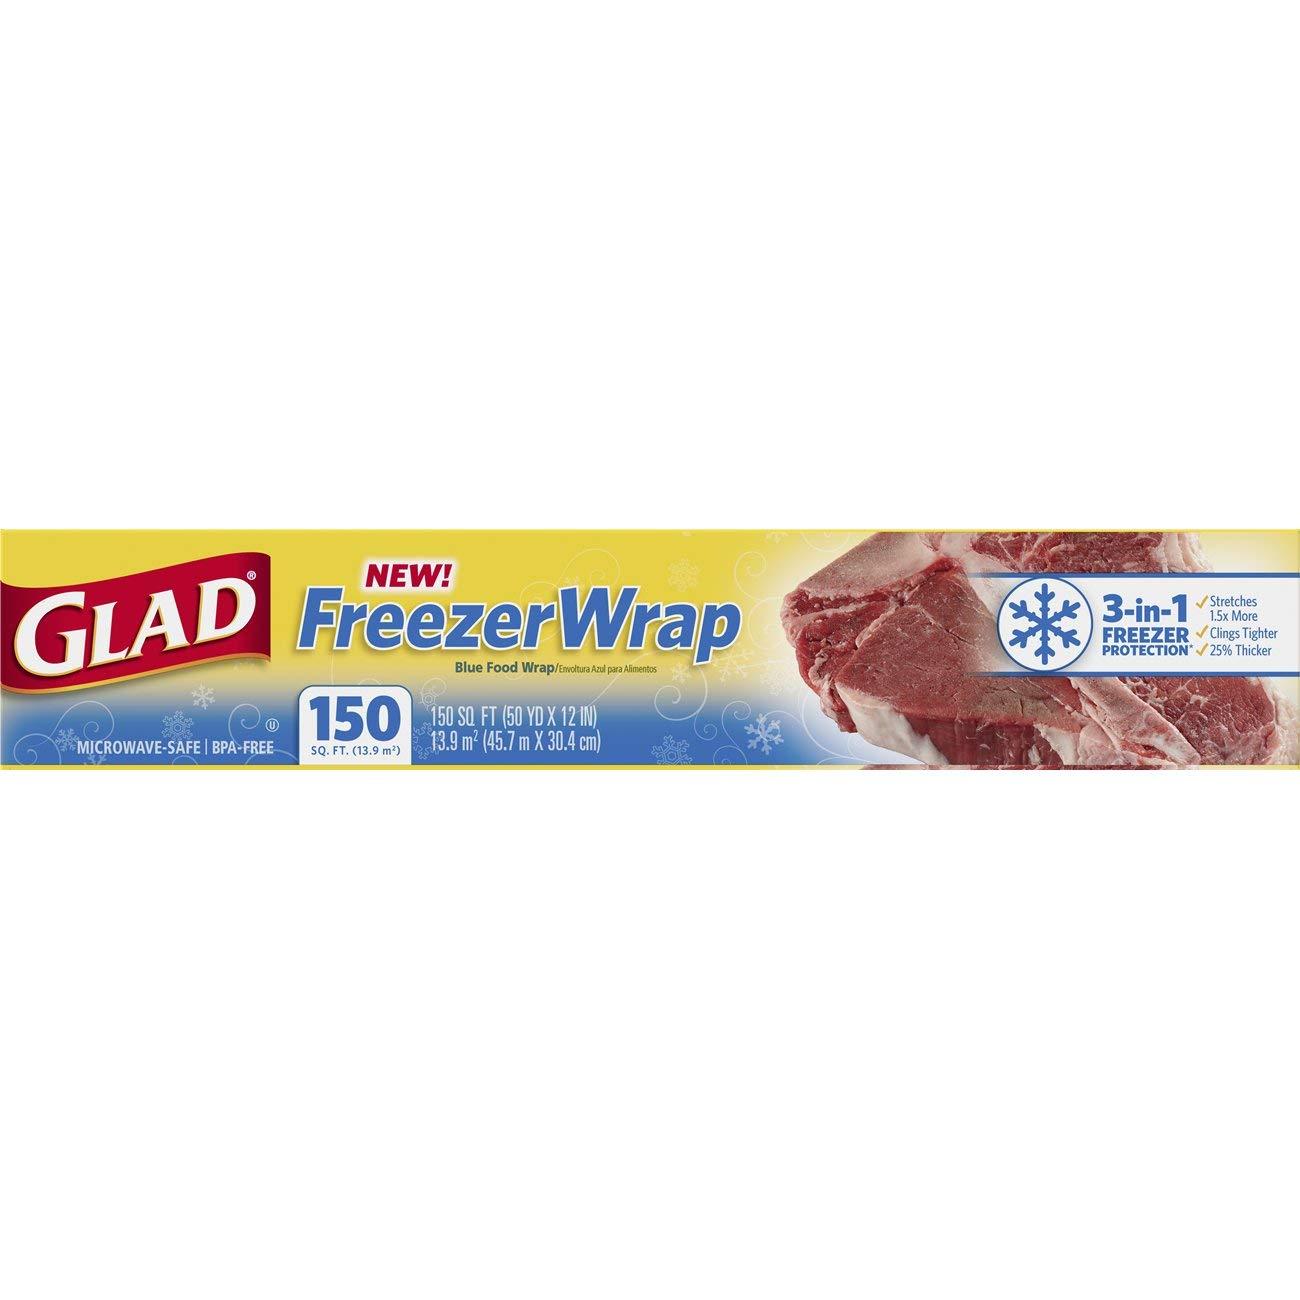 Amazon.com: Glad FreezerWrap Plastic Food Wrap - 150 Square Foot ...